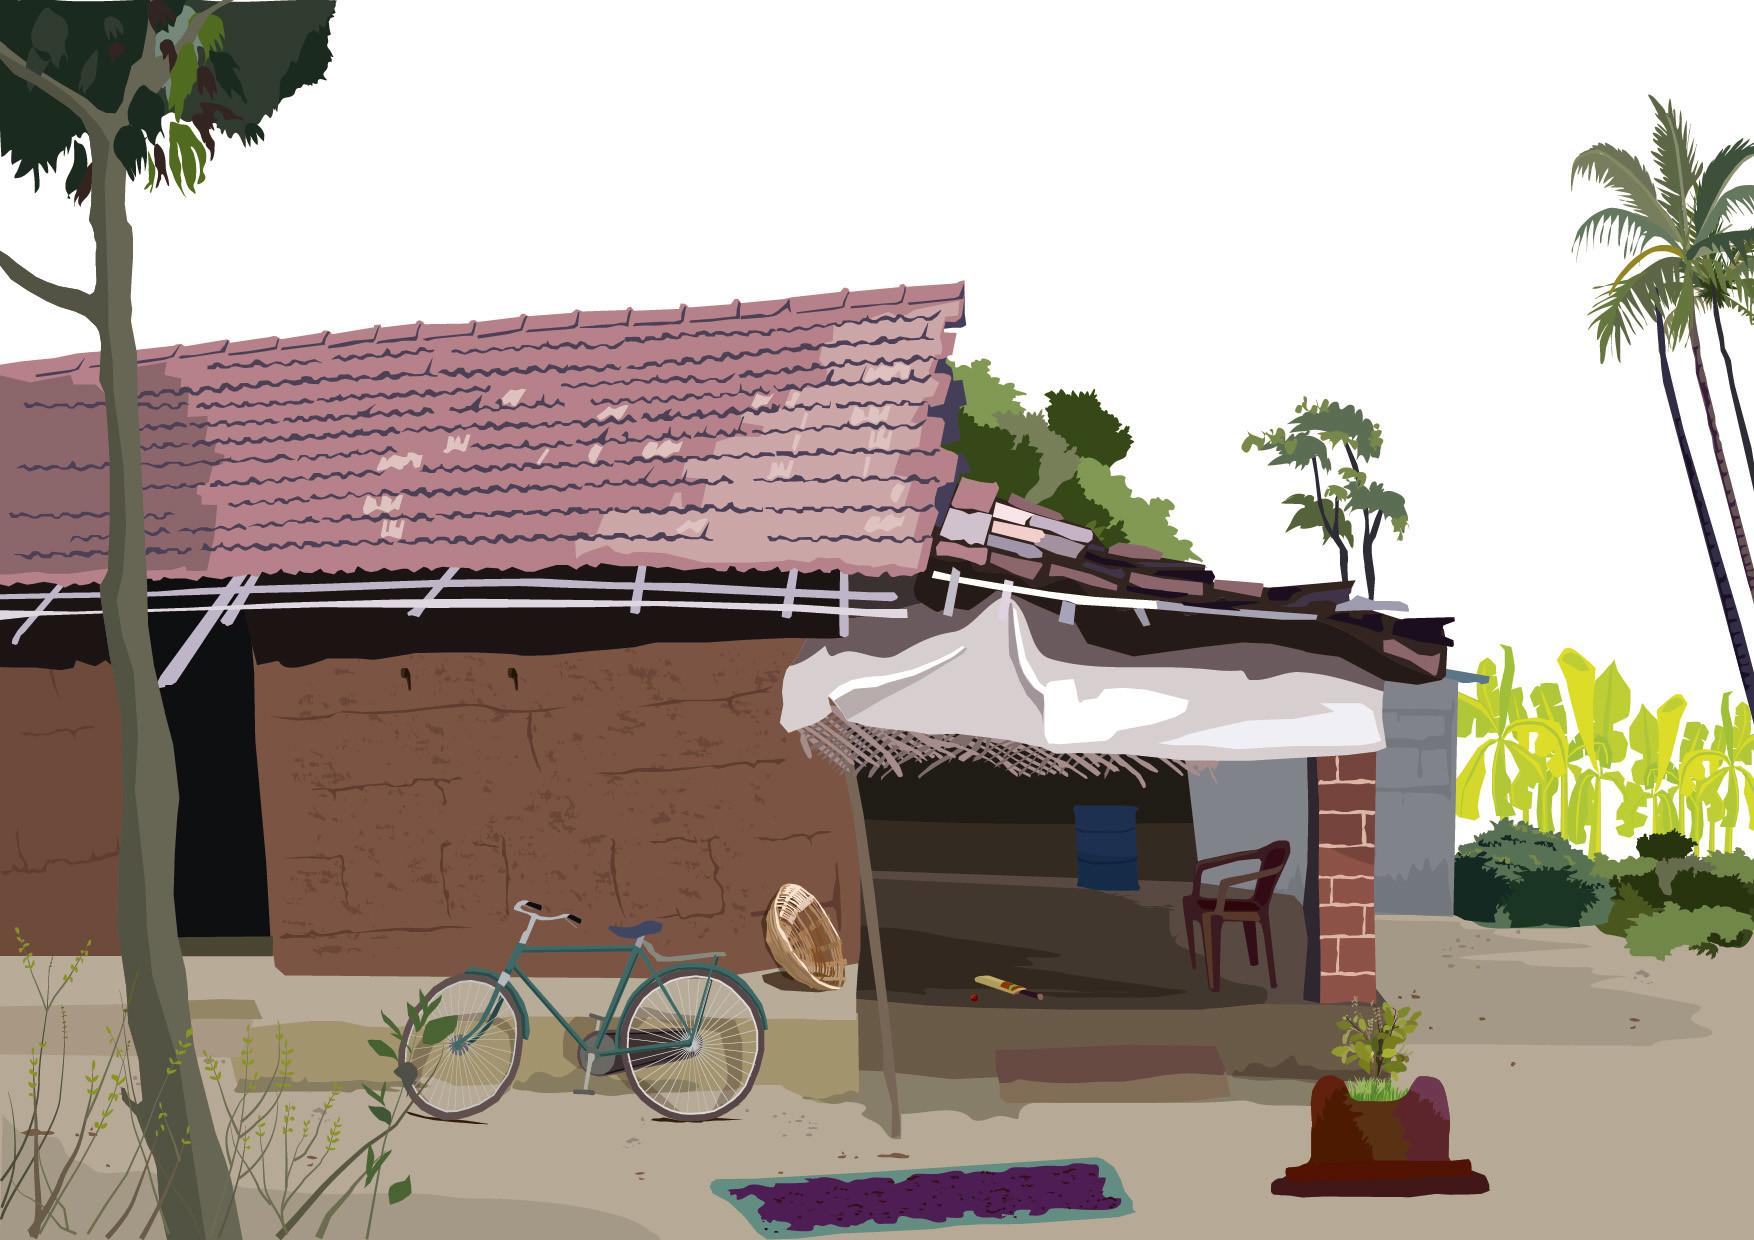 Rajesh sawant konkan house mausi vadkol 01